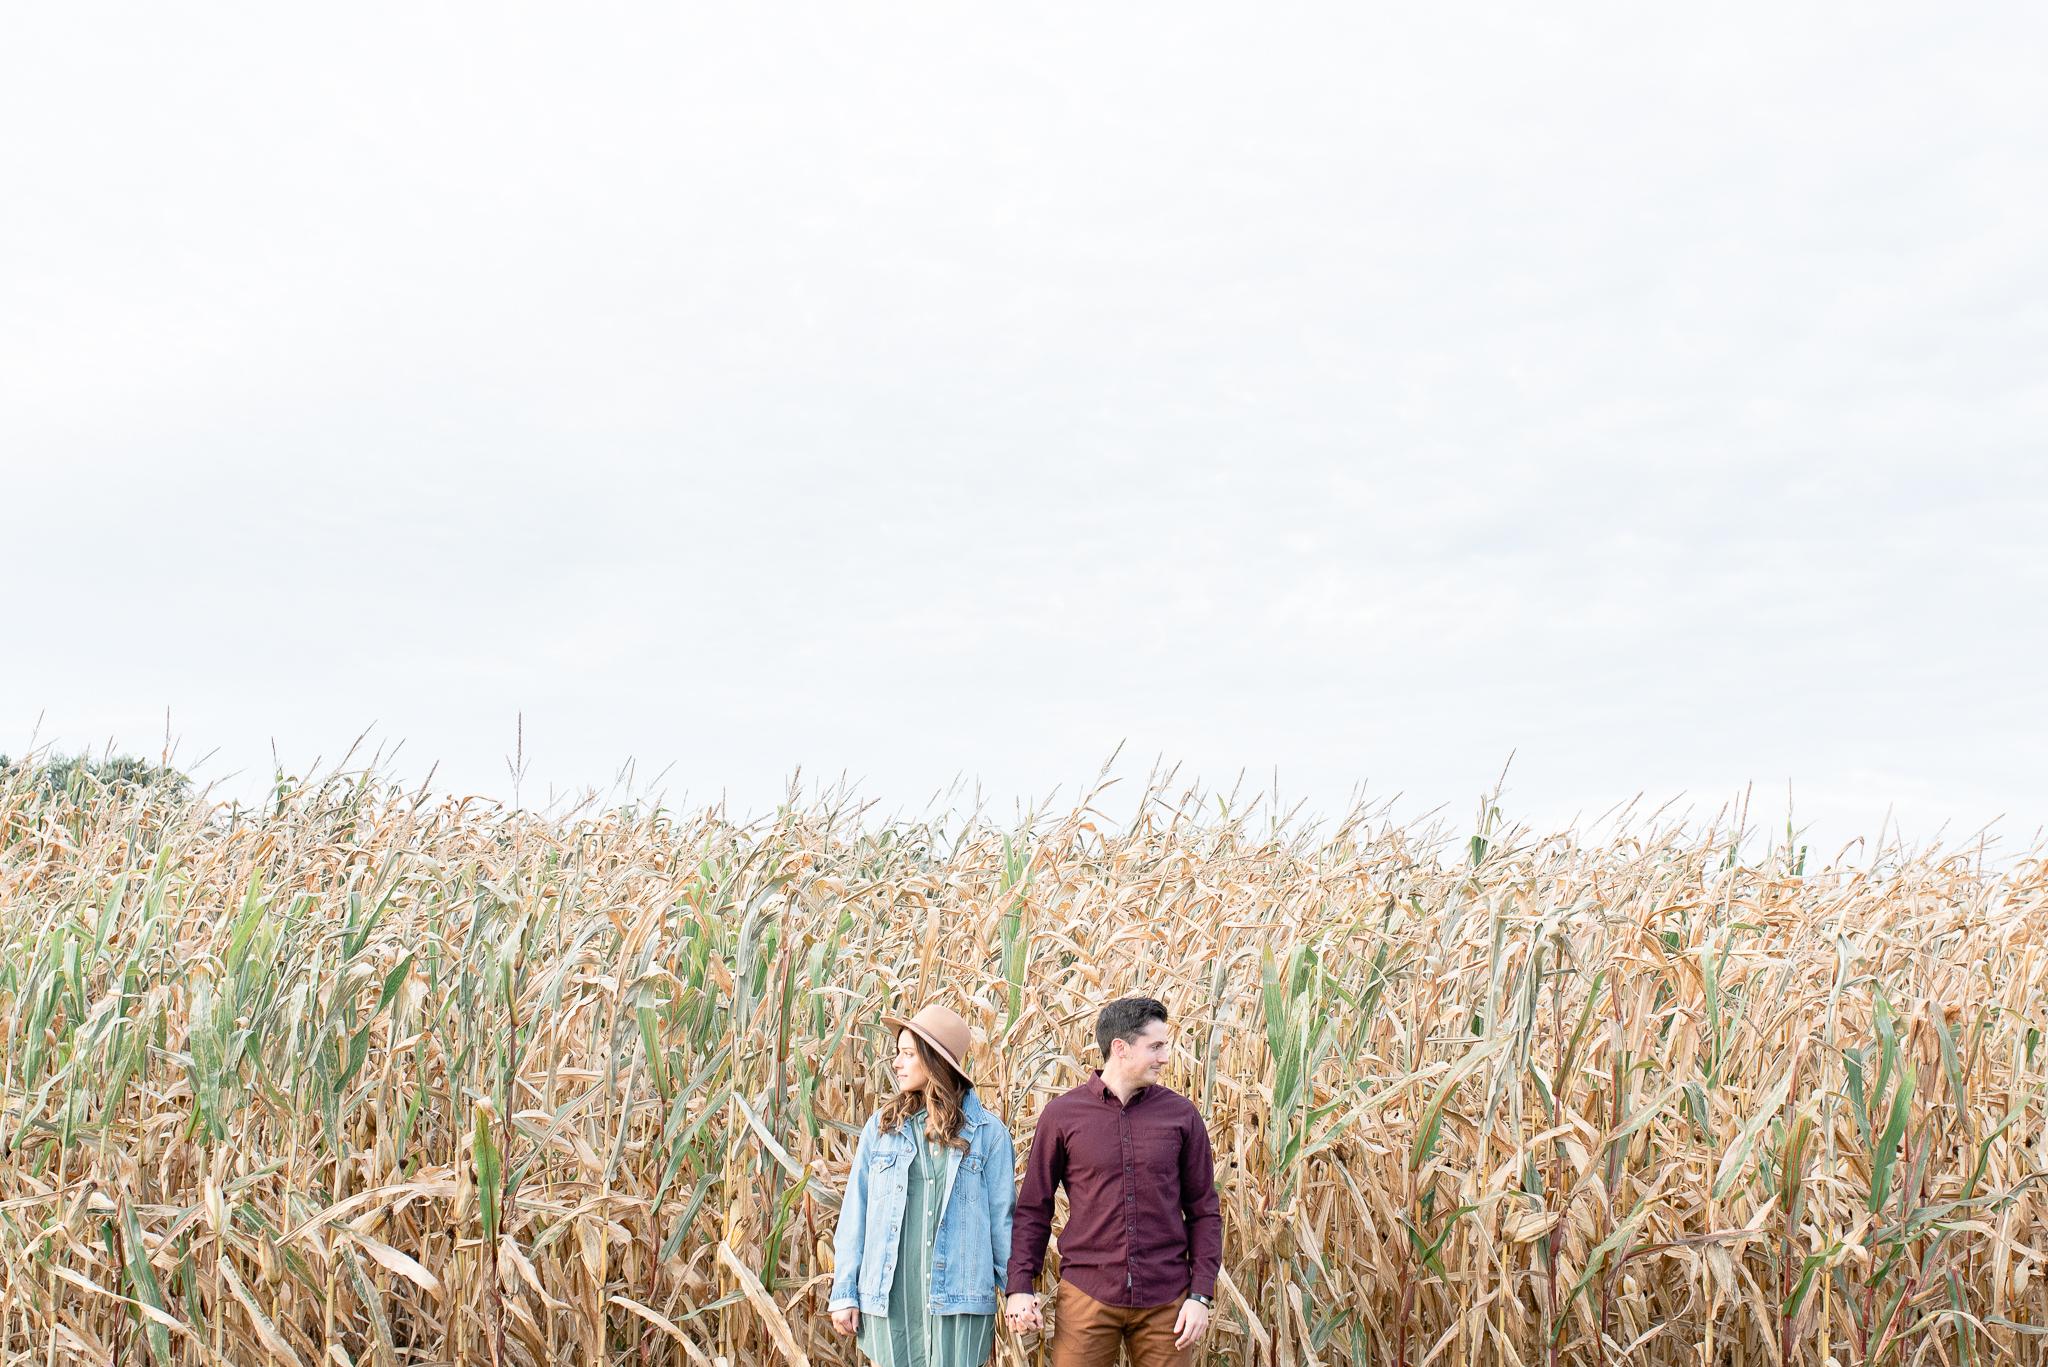 10_19_2018_Dana_Slifer_Photography_B_and_K_Engagement_Session_WEB_31.jpg